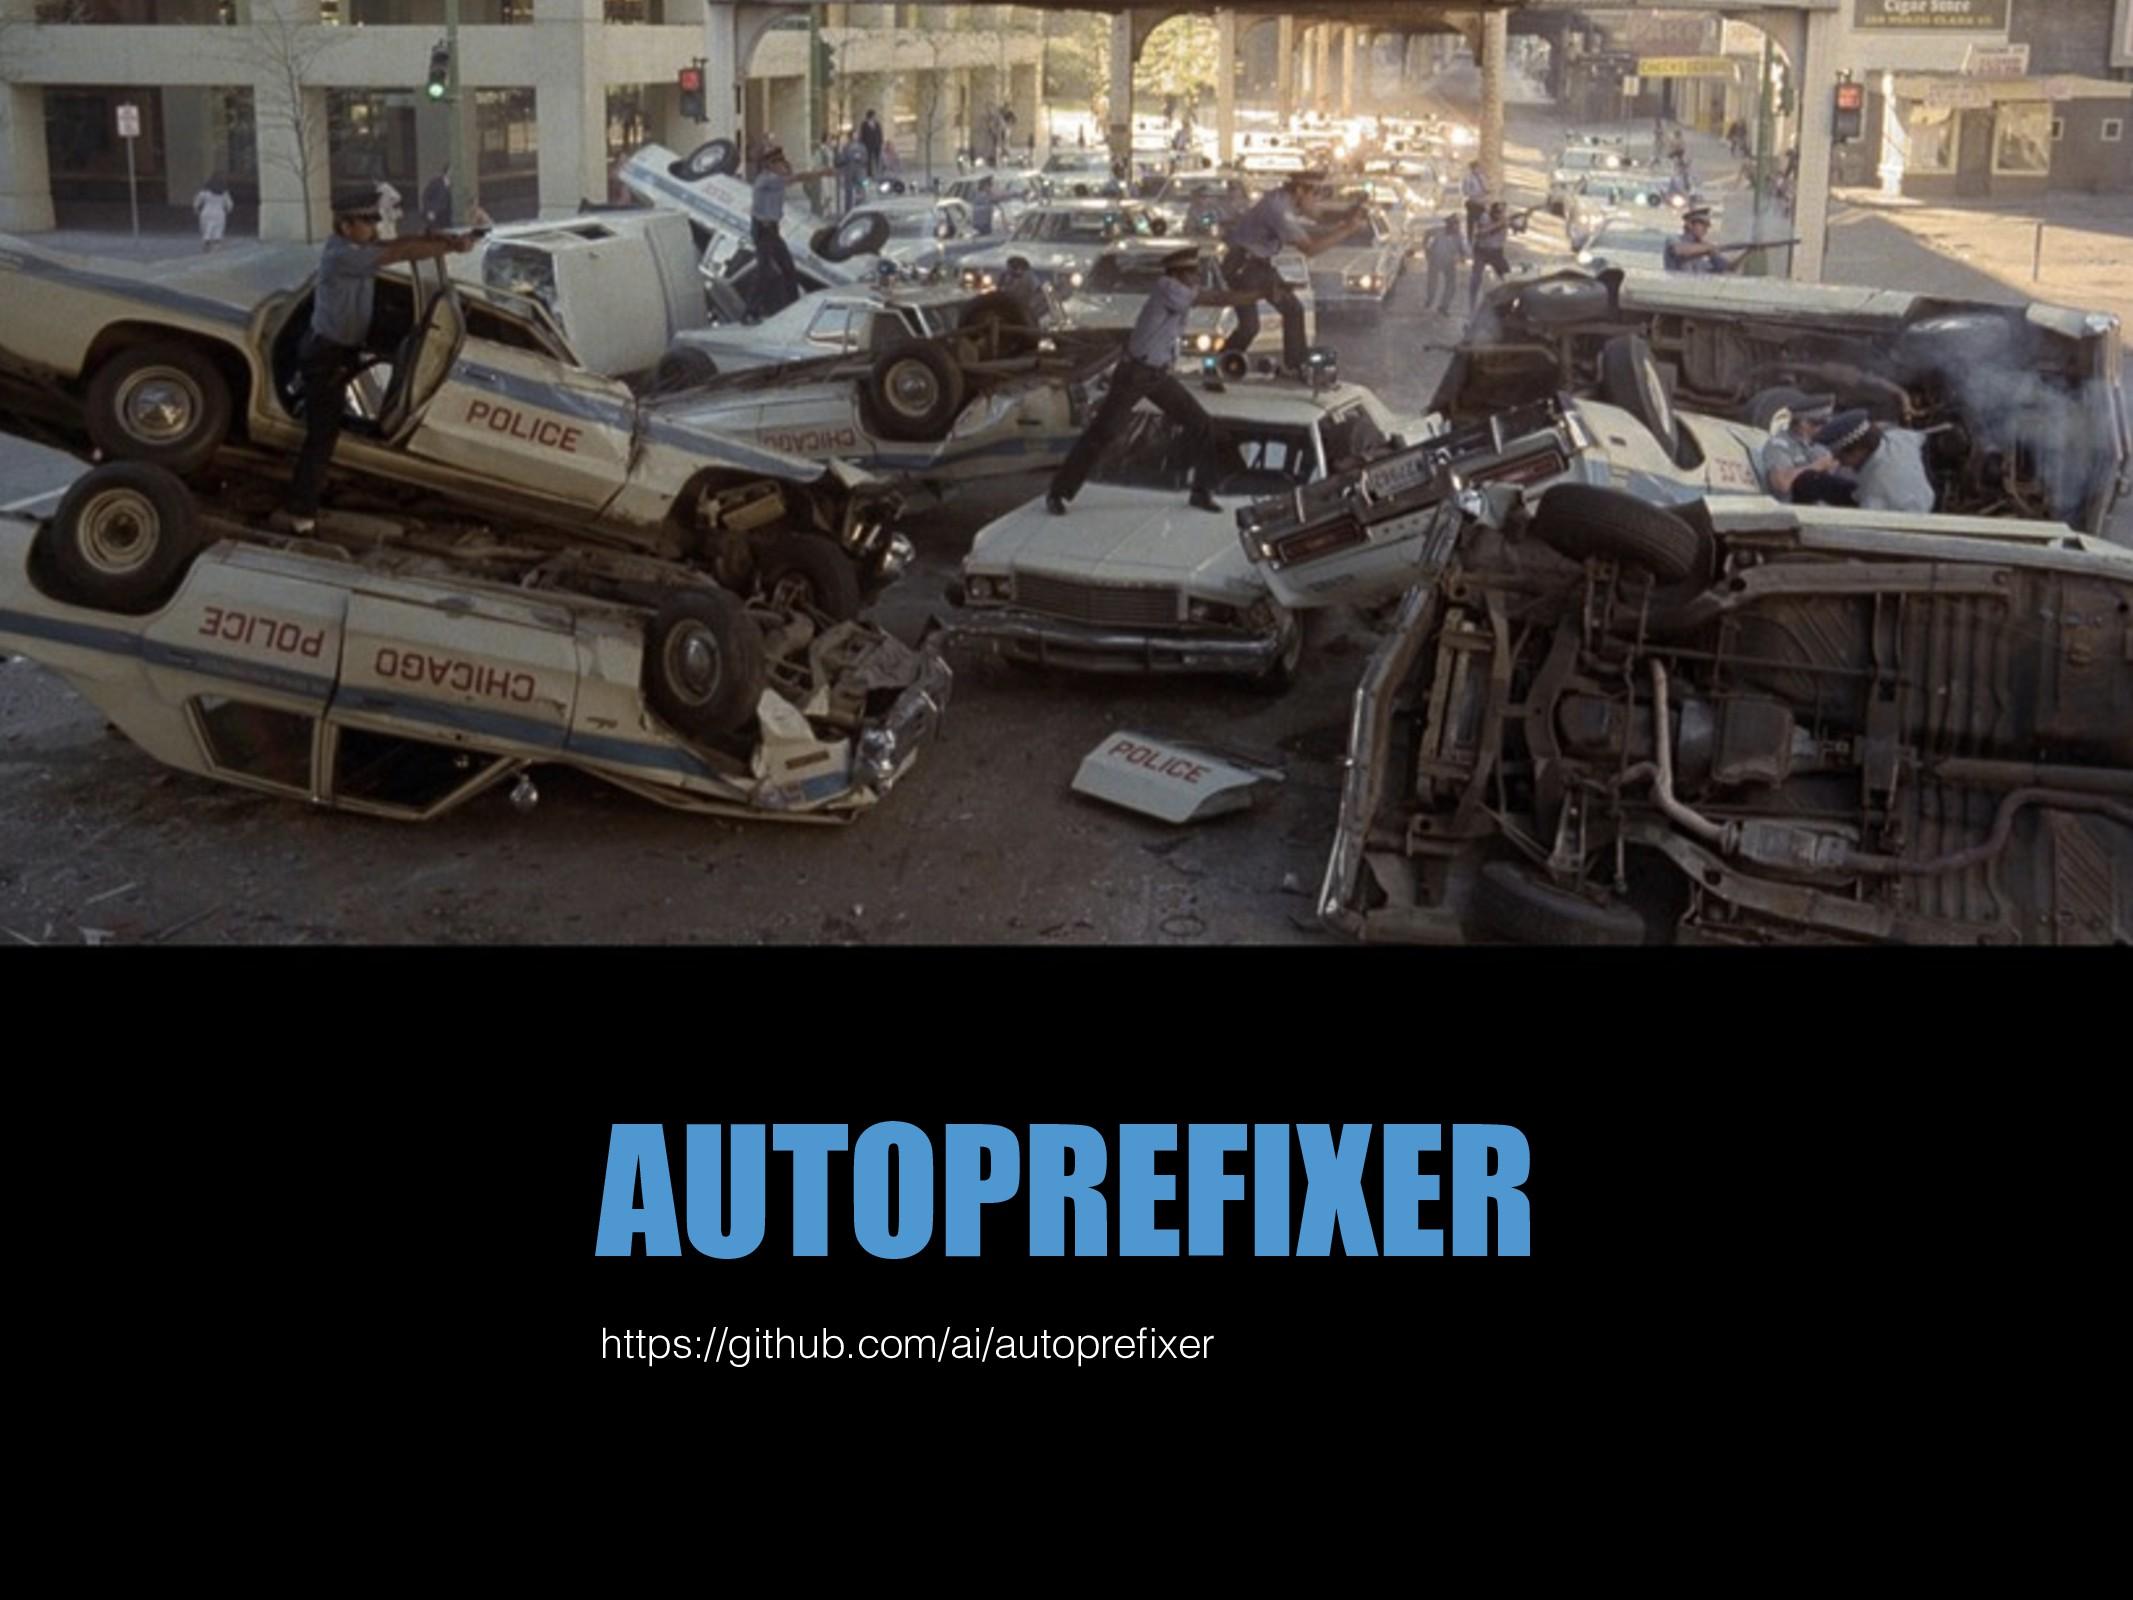 AUTOPREFIXER https://github.com/ai/autoprefixer